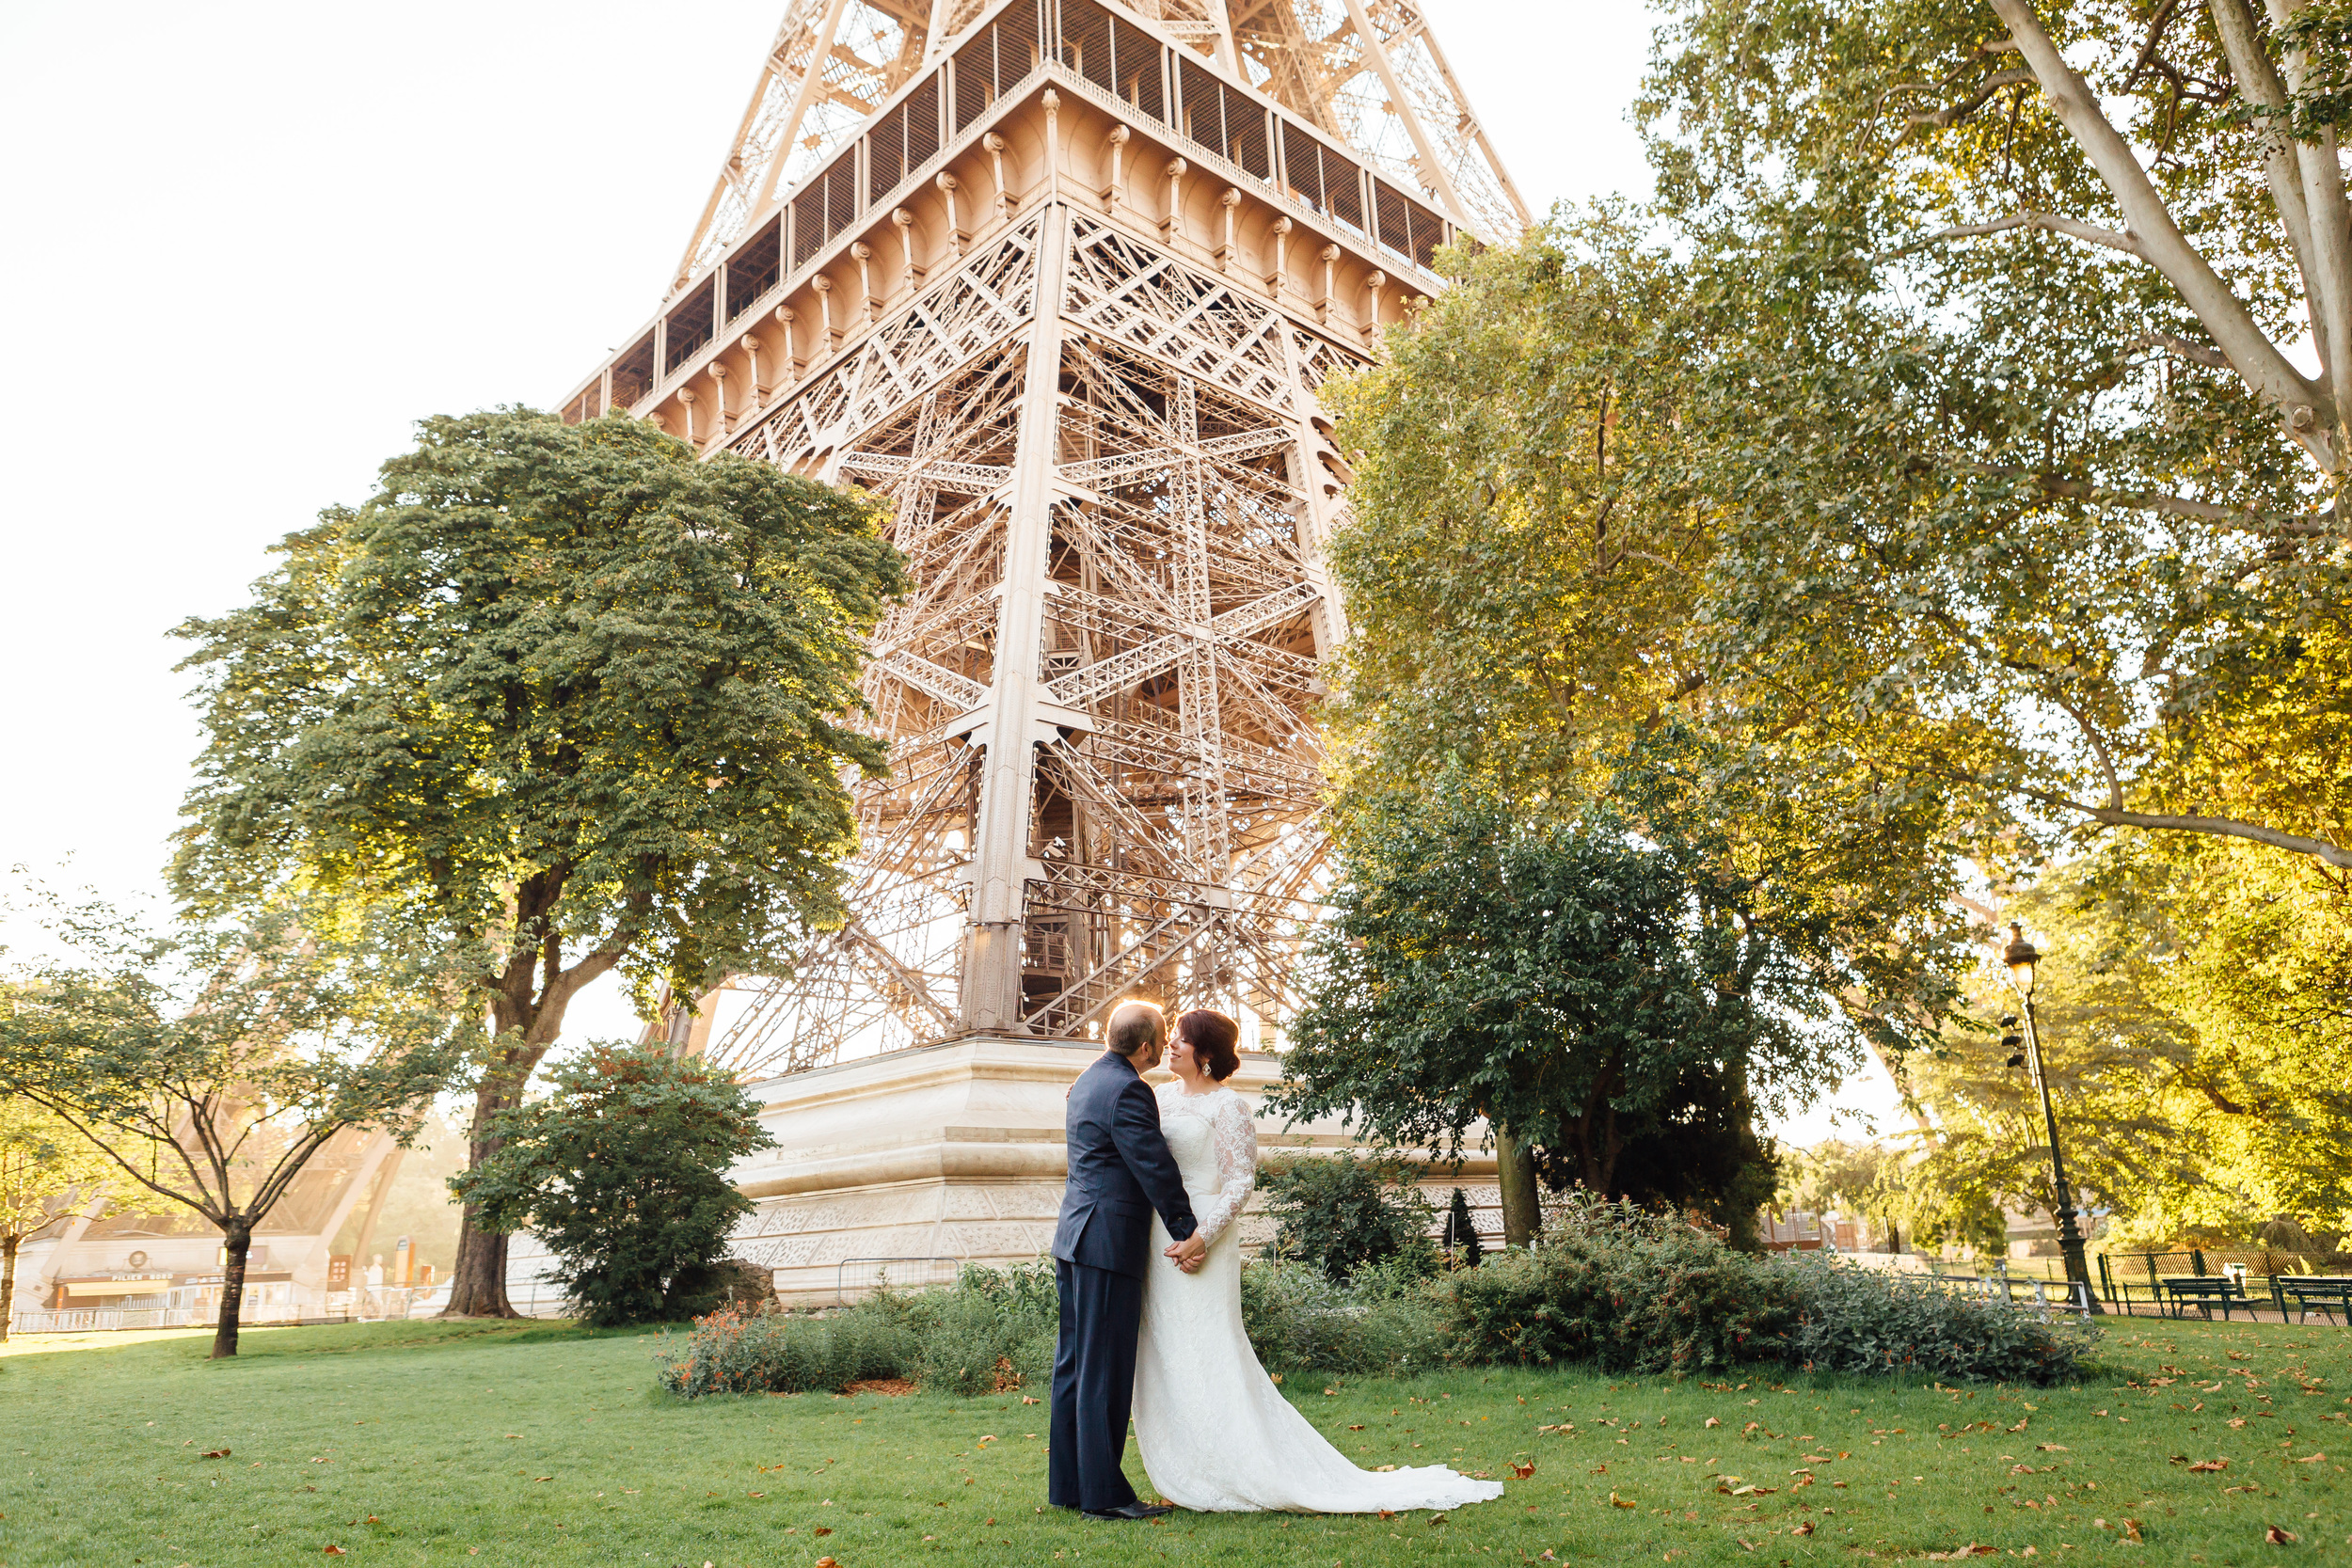 paris photographer wedding elopement couple under the eiffel tower